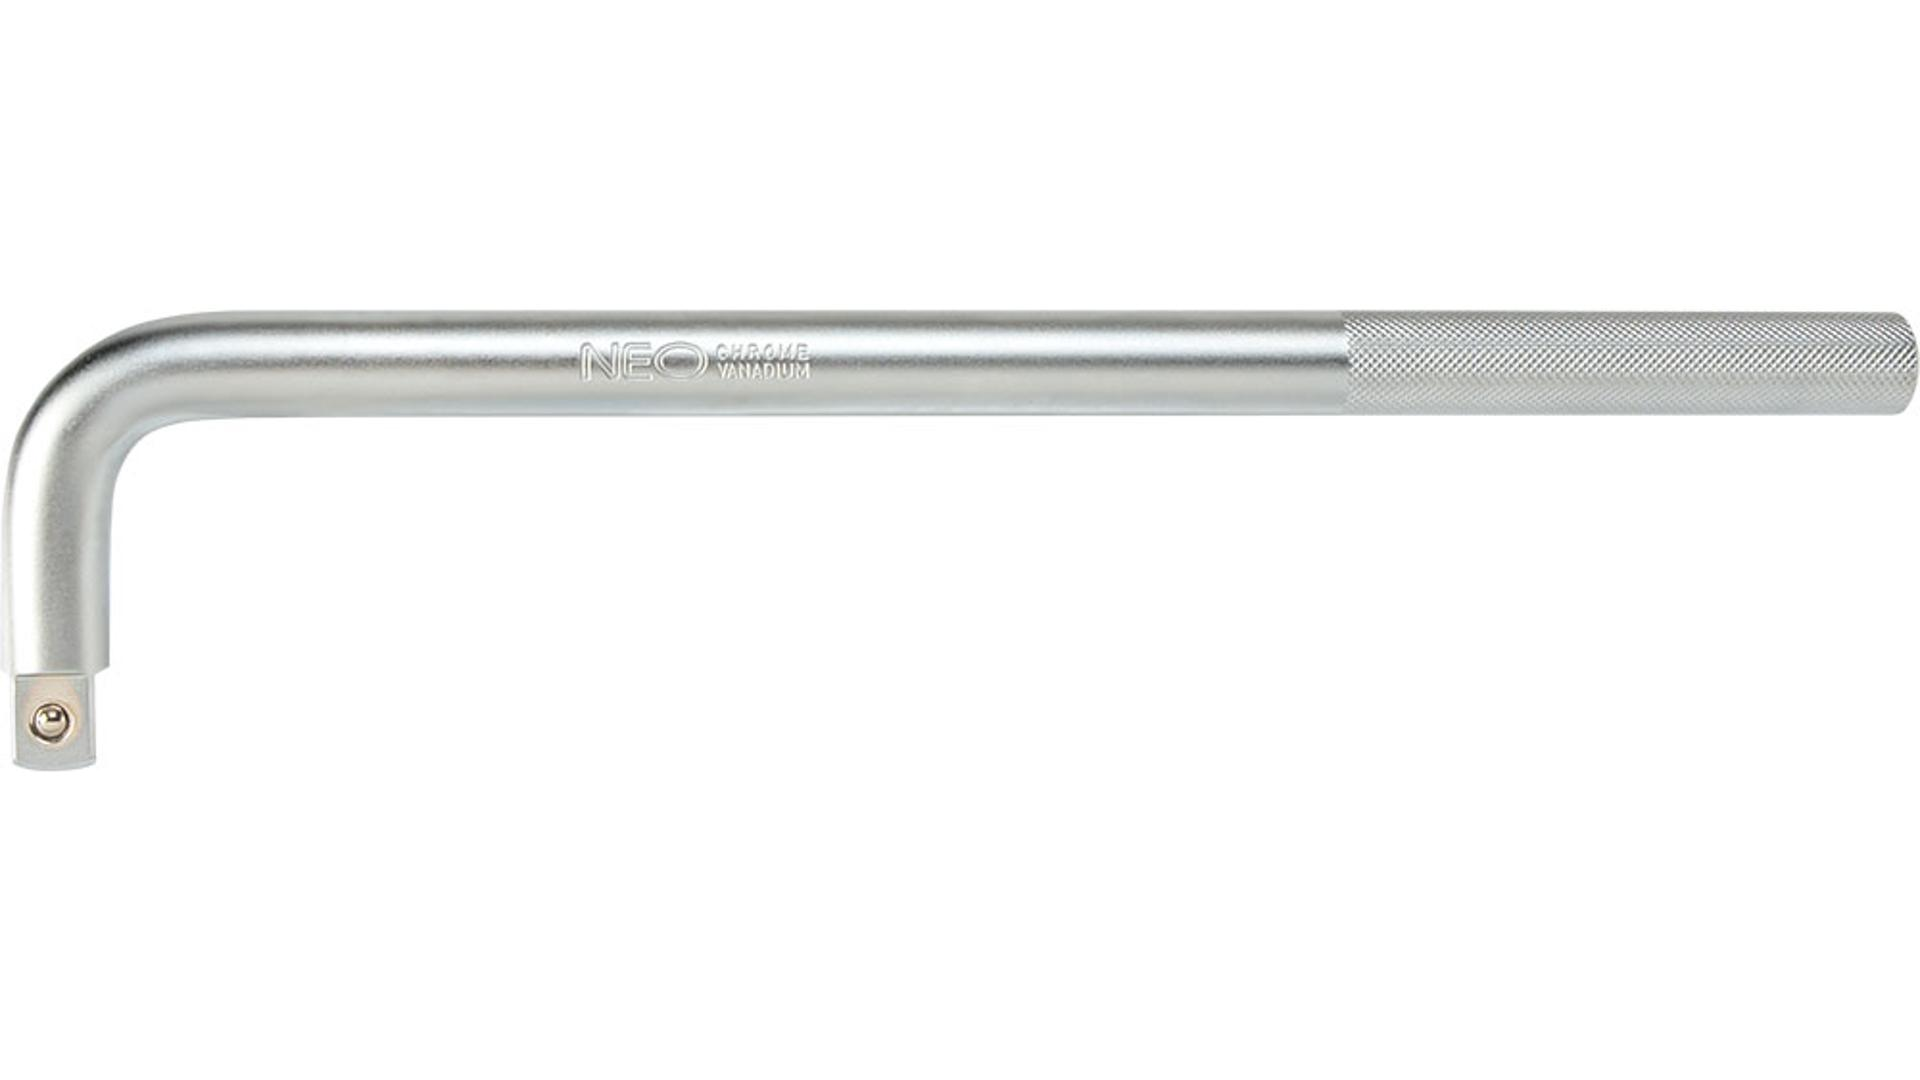 NEO Koliesko typu L 3/4, 450mm